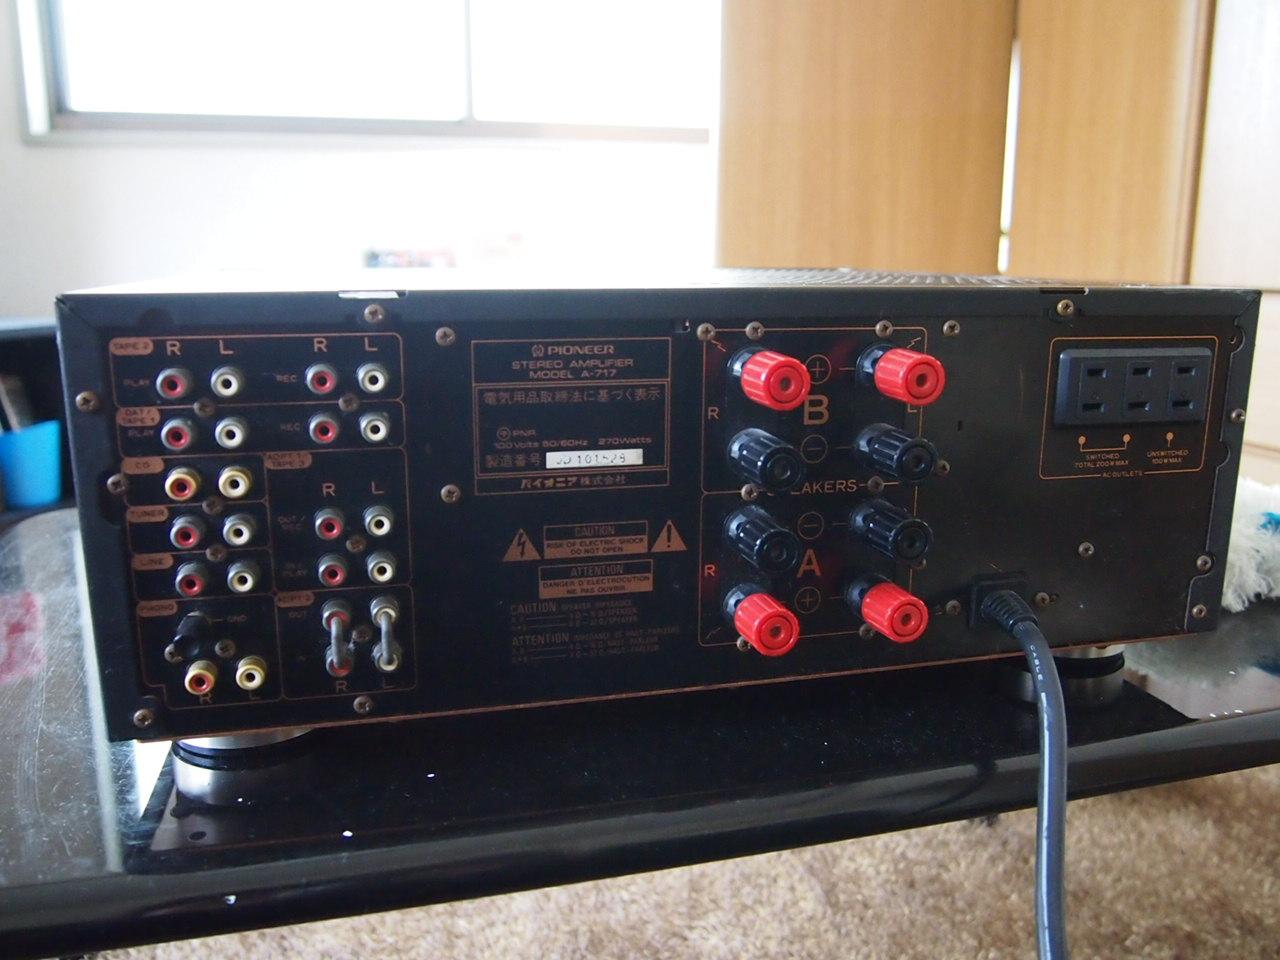 A-717 04